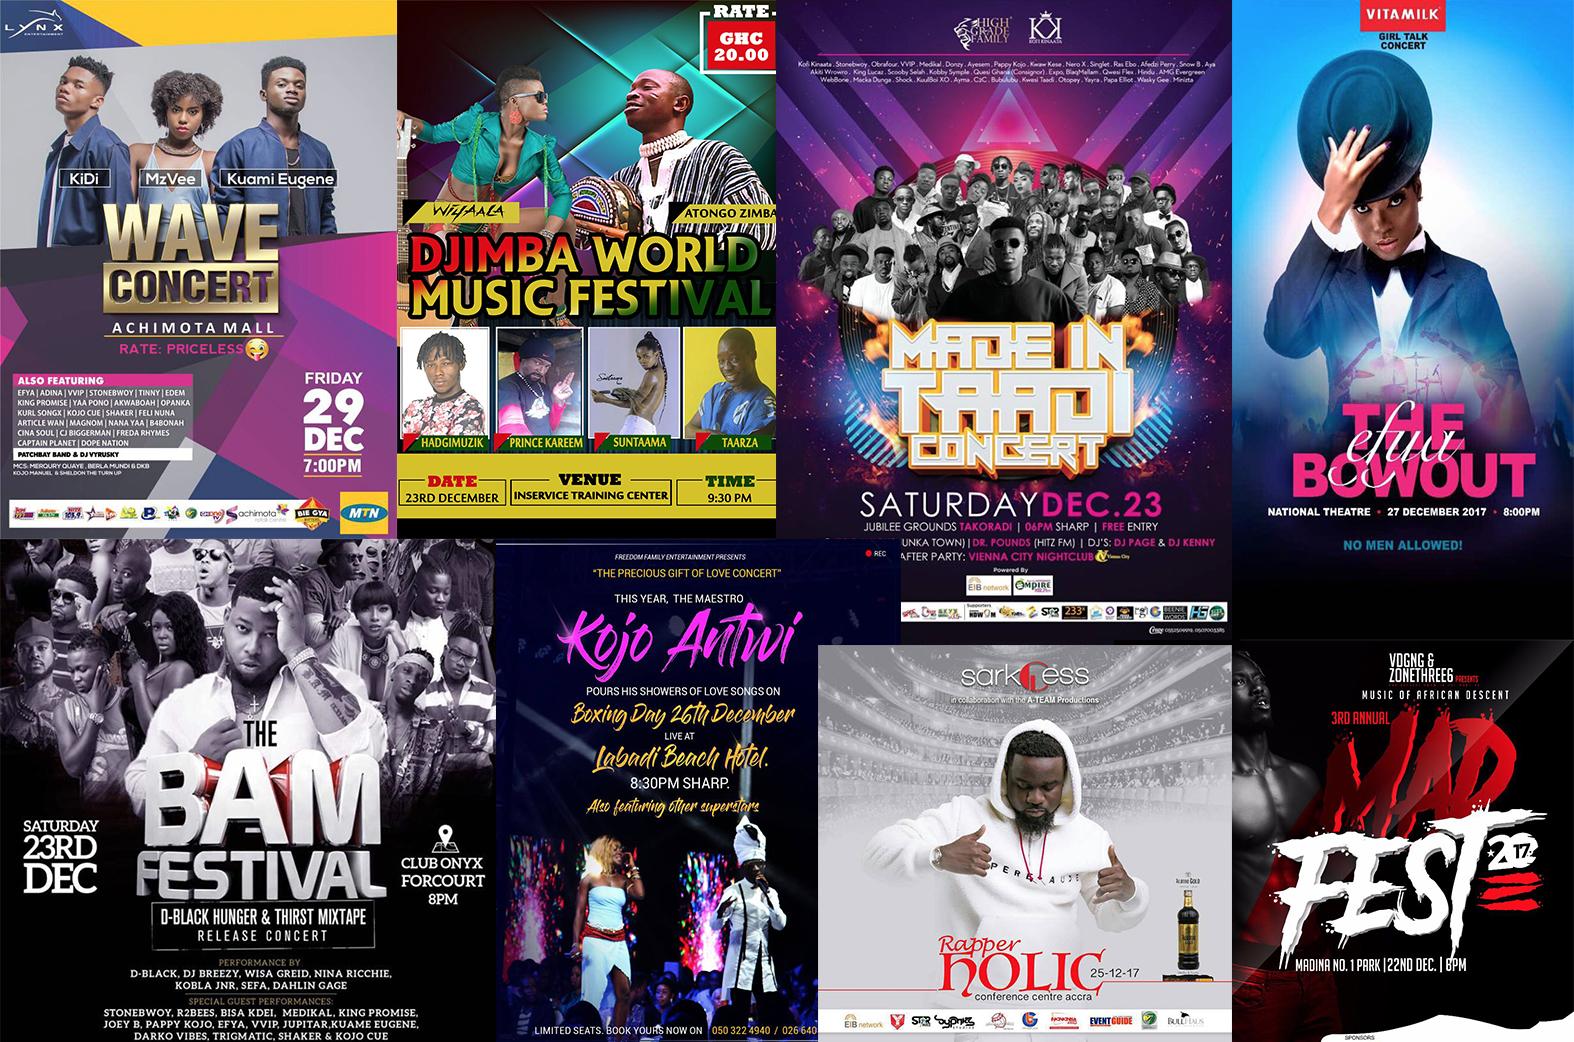 ghana music, rapperholic, bhim concert, xmas events